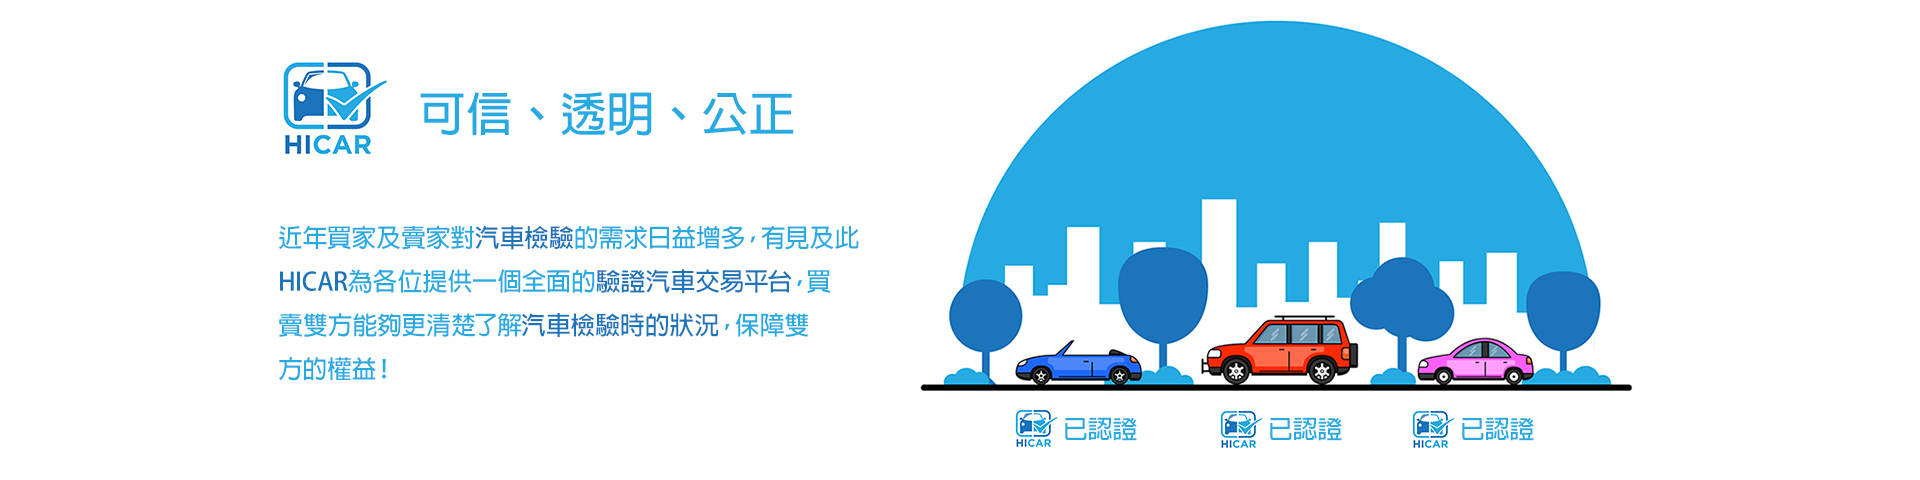 http://hicar.com.hk/wp-content/uploads/2018/07/可信透明公正.jpg